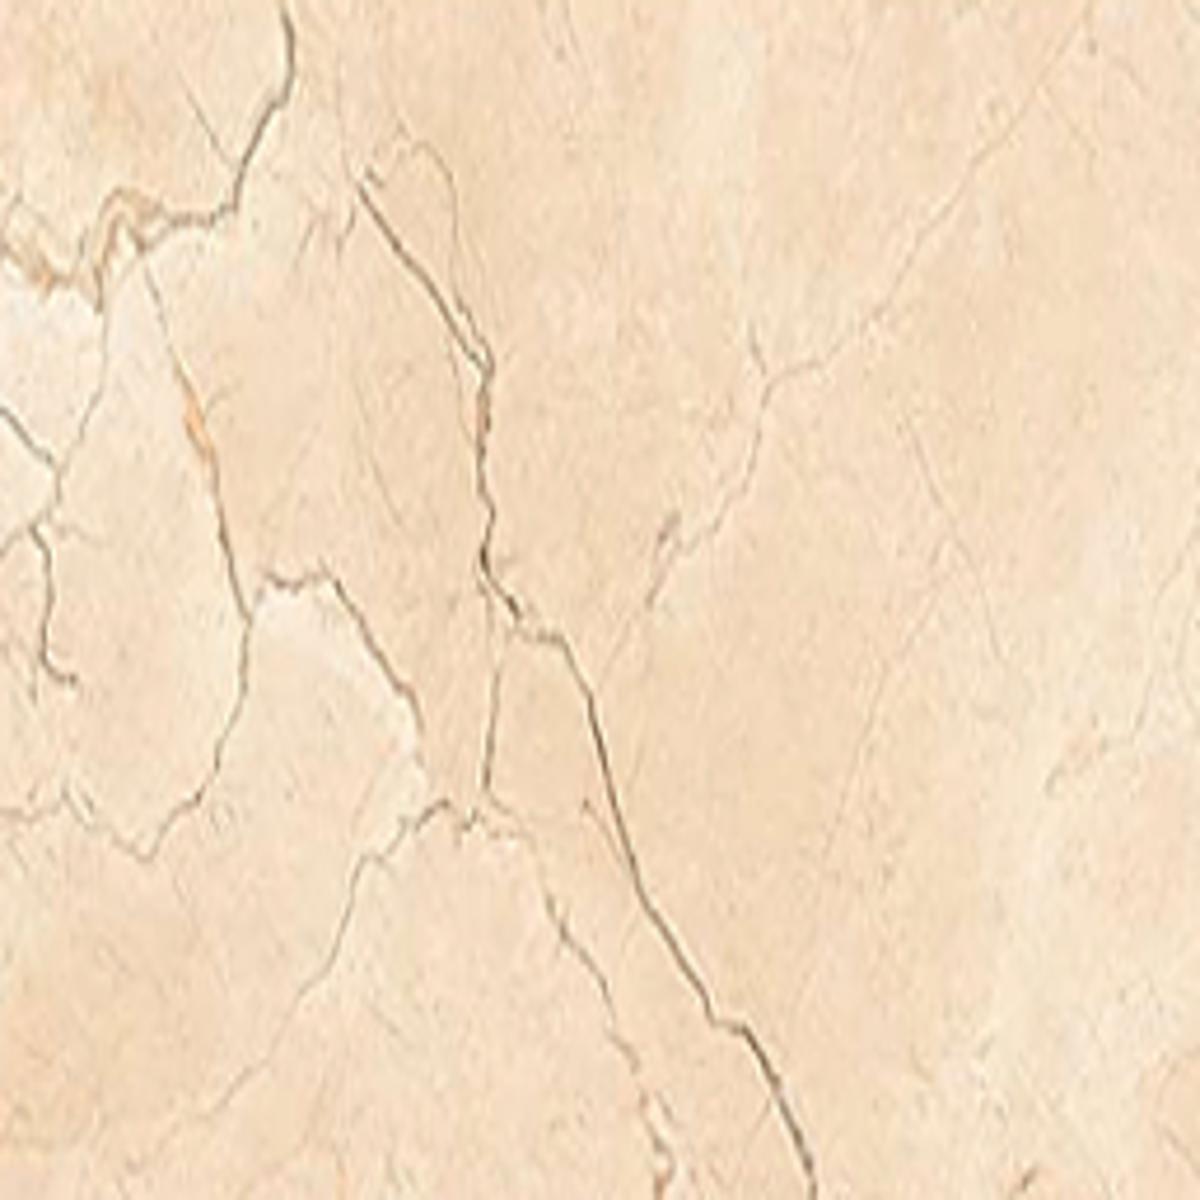 12x24 brown beige royal crema marfil polished floor wall porcelain tile